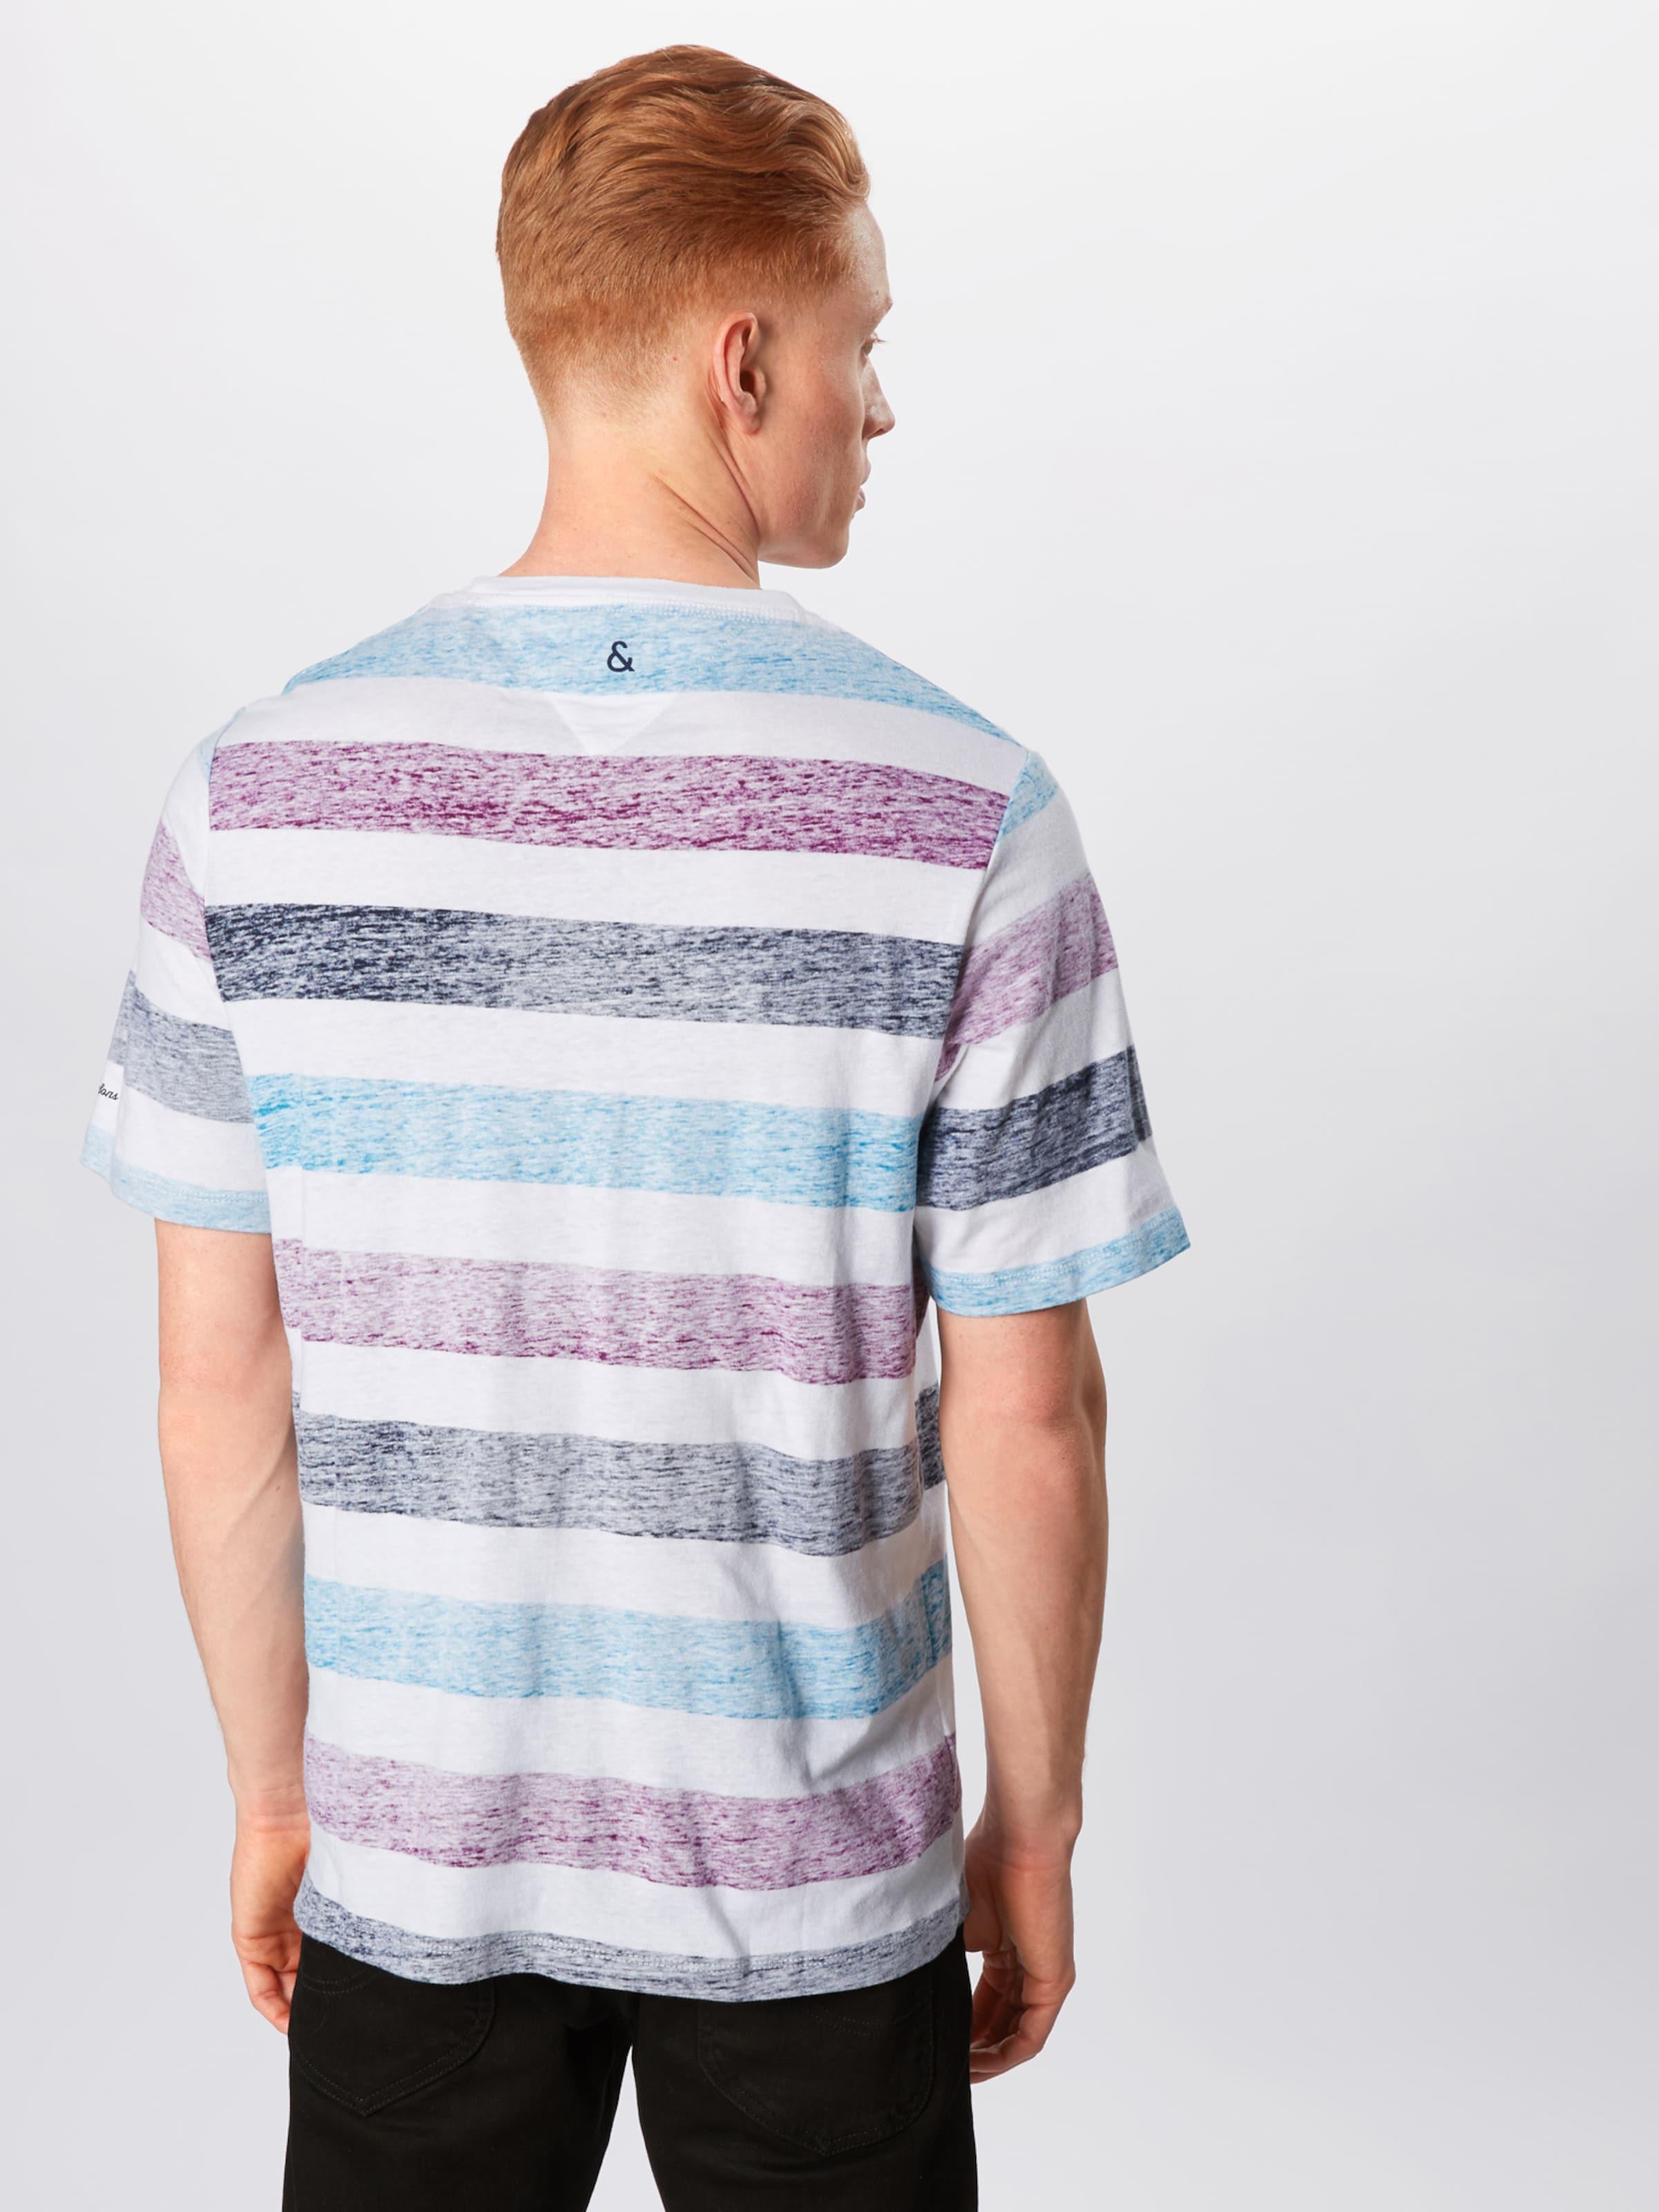 Sons HellblauLila T In 'frank' Weiß shirt Coloursamp; WEDHYe2I9